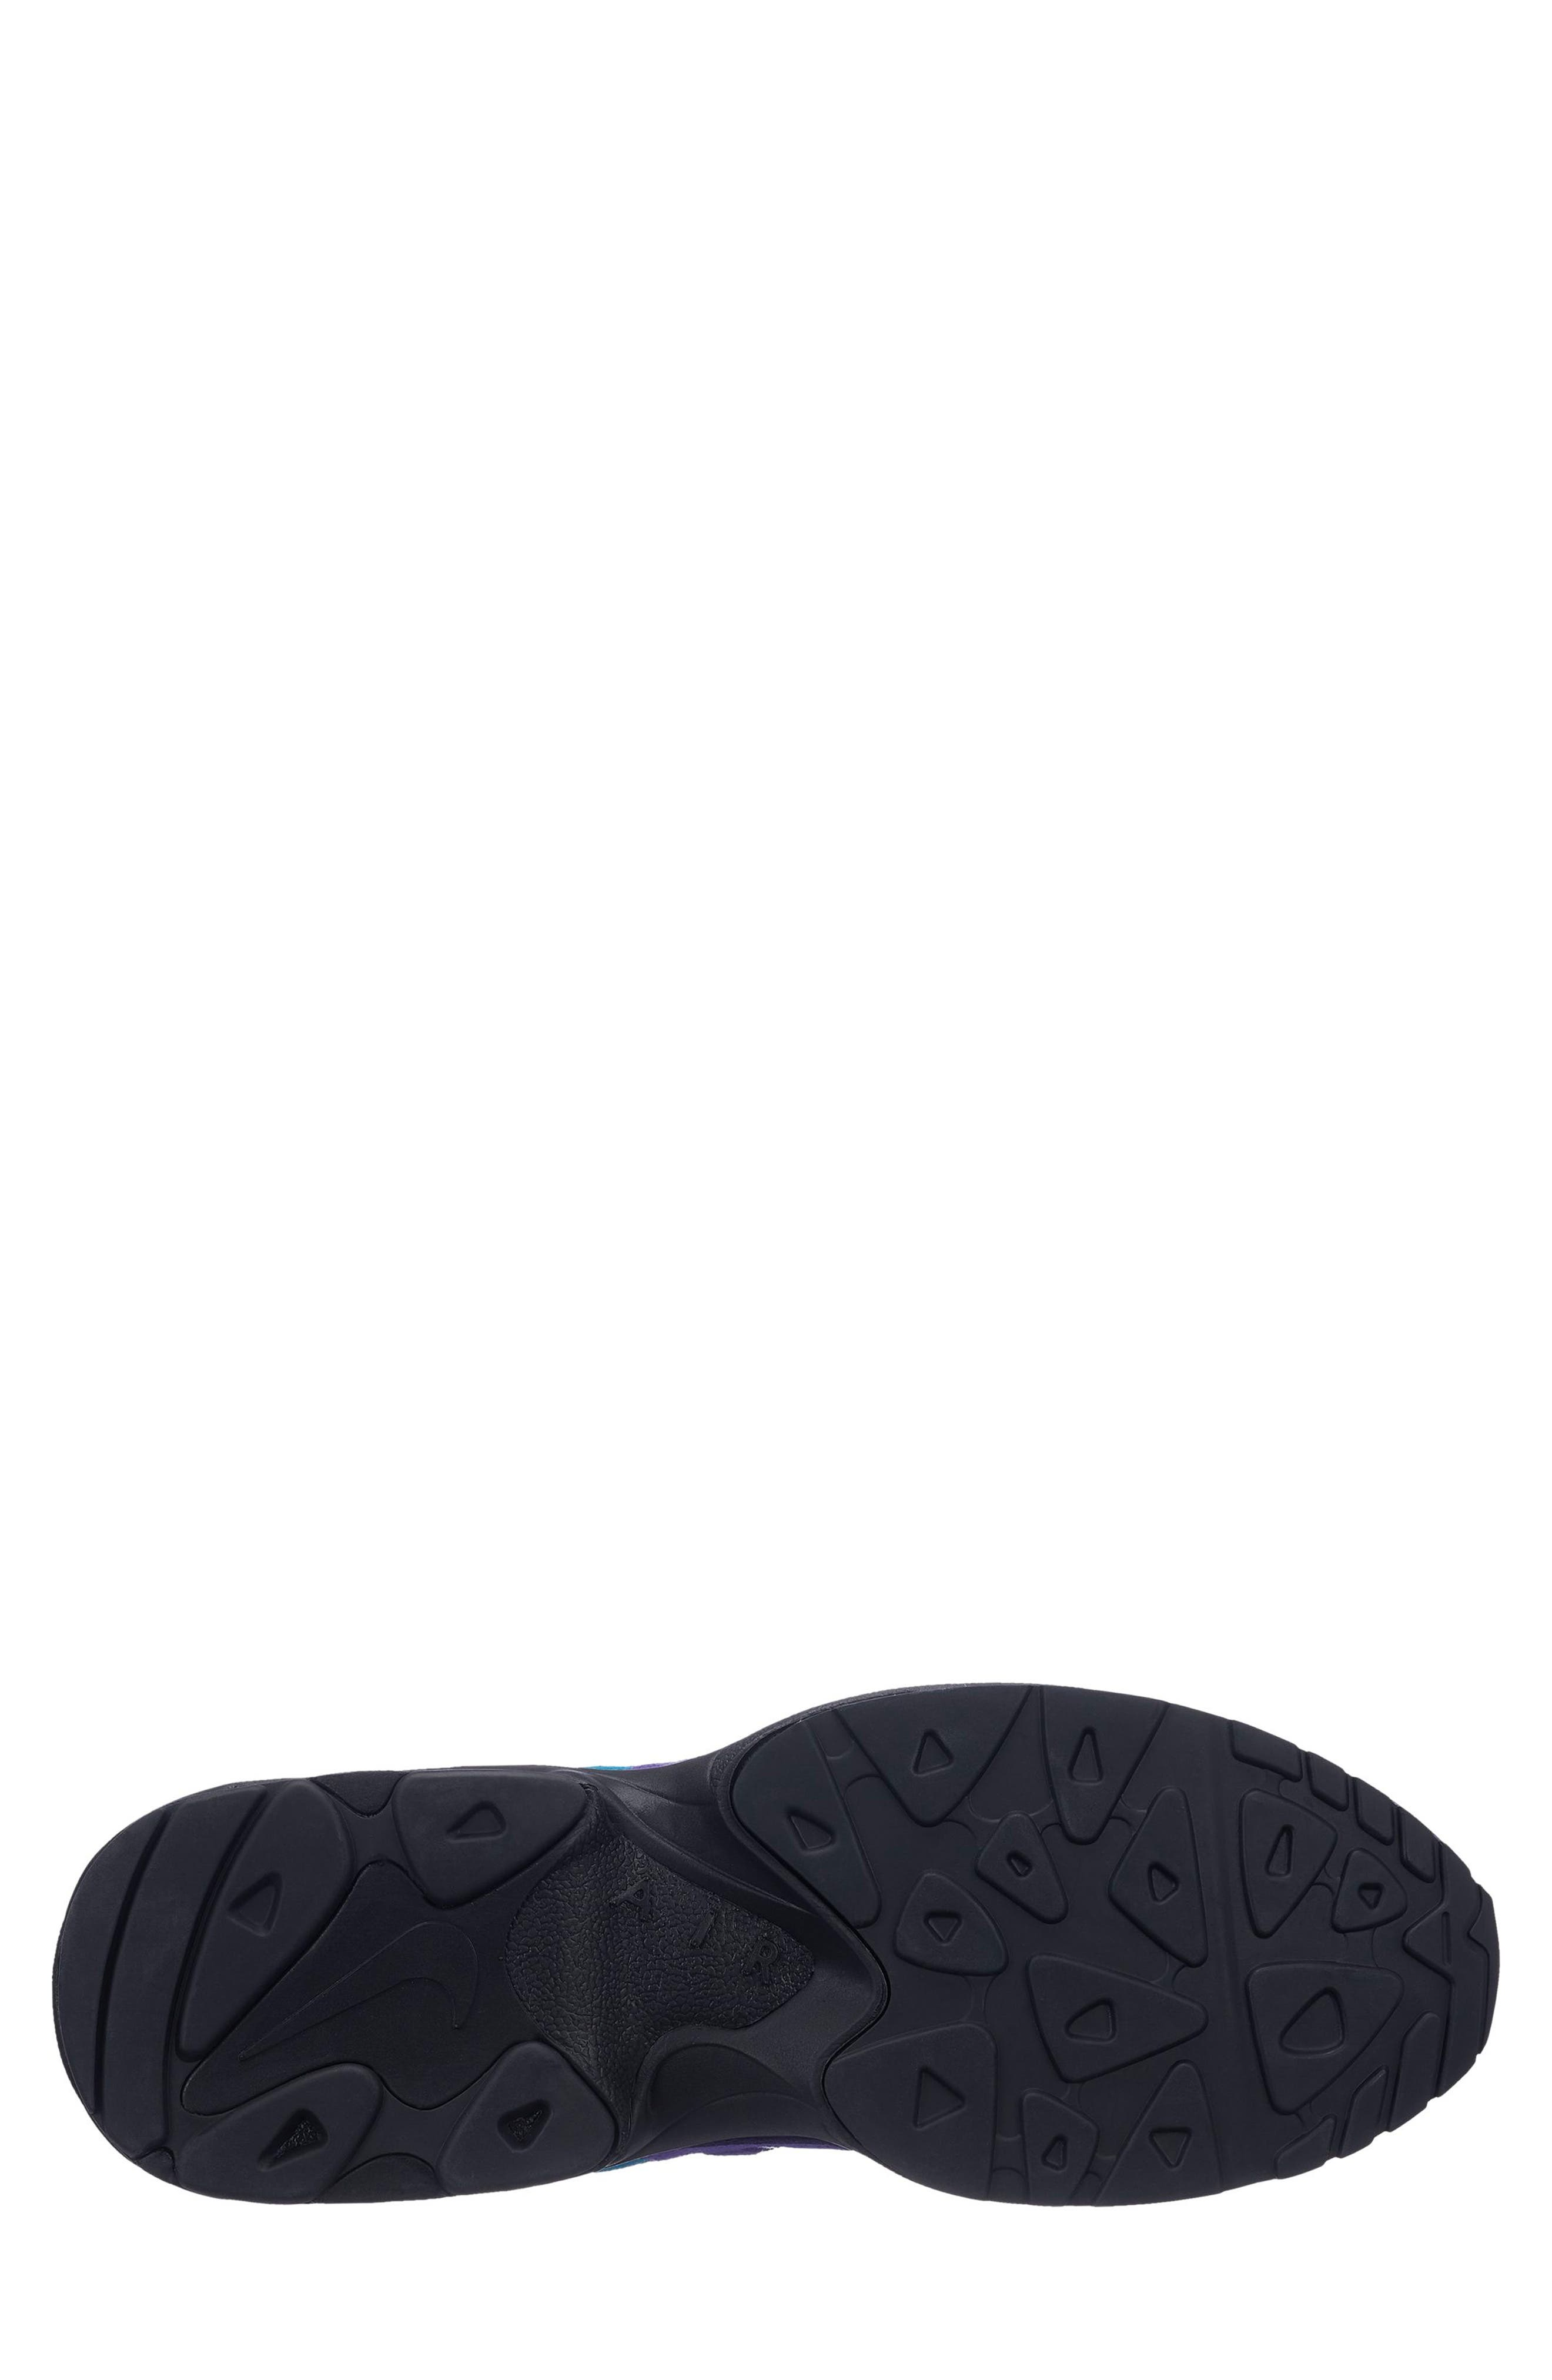 NIKE, Air Max2 Light Sneaker, Alternate thumbnail 5, color, PURPLE/ TEAL/ BLACK/ WHITE